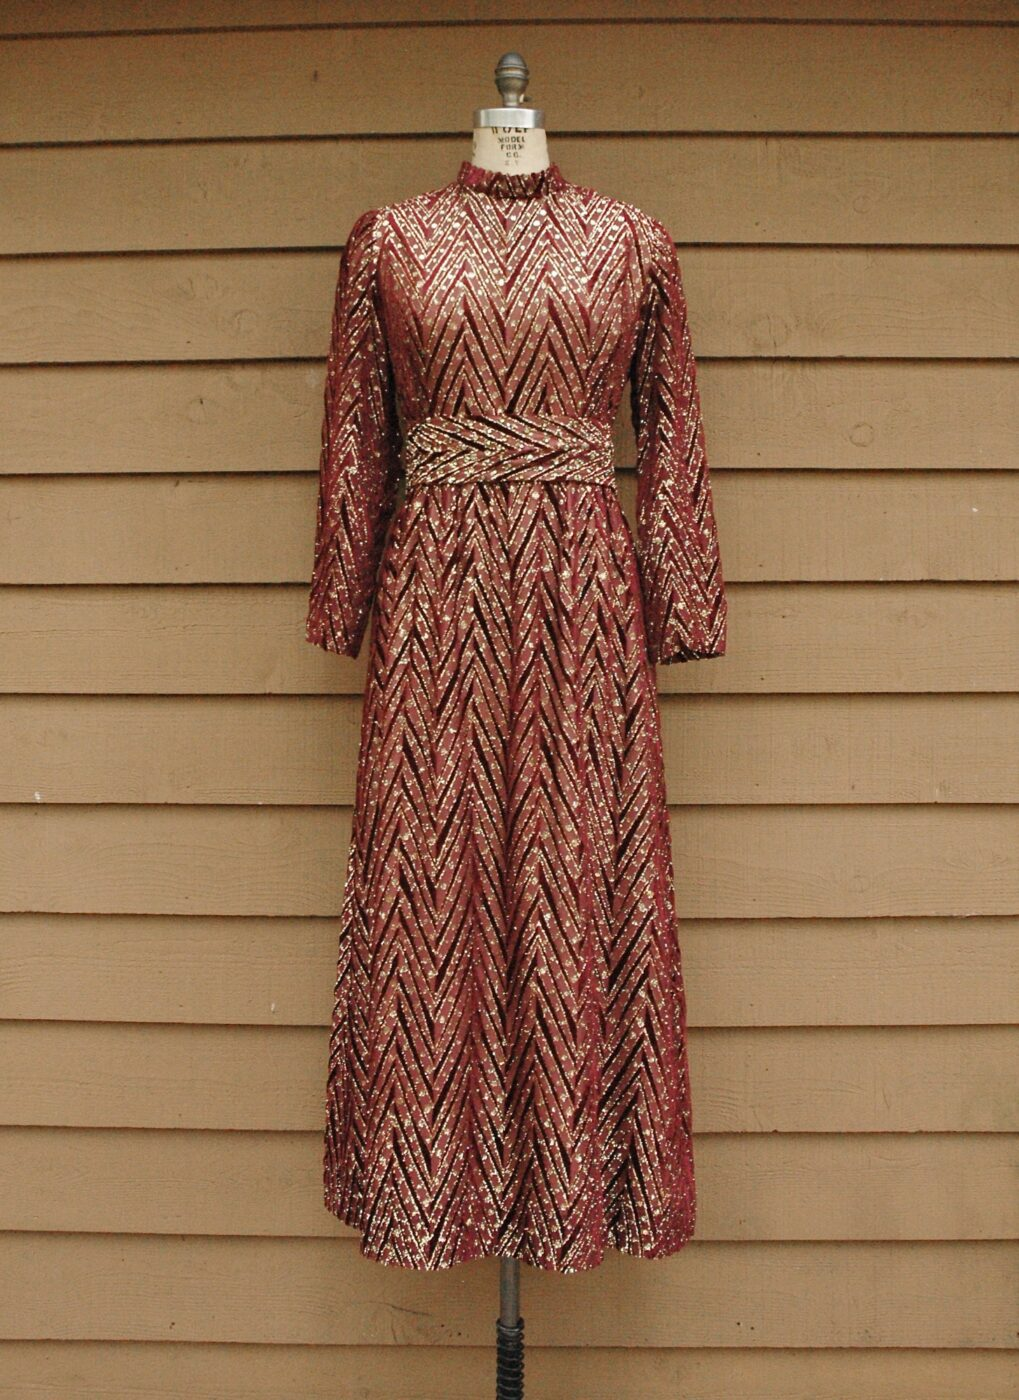 1960s-70s-Razooks-burnout-burgundy-gold-velvet-rhinestone-maxi-dress